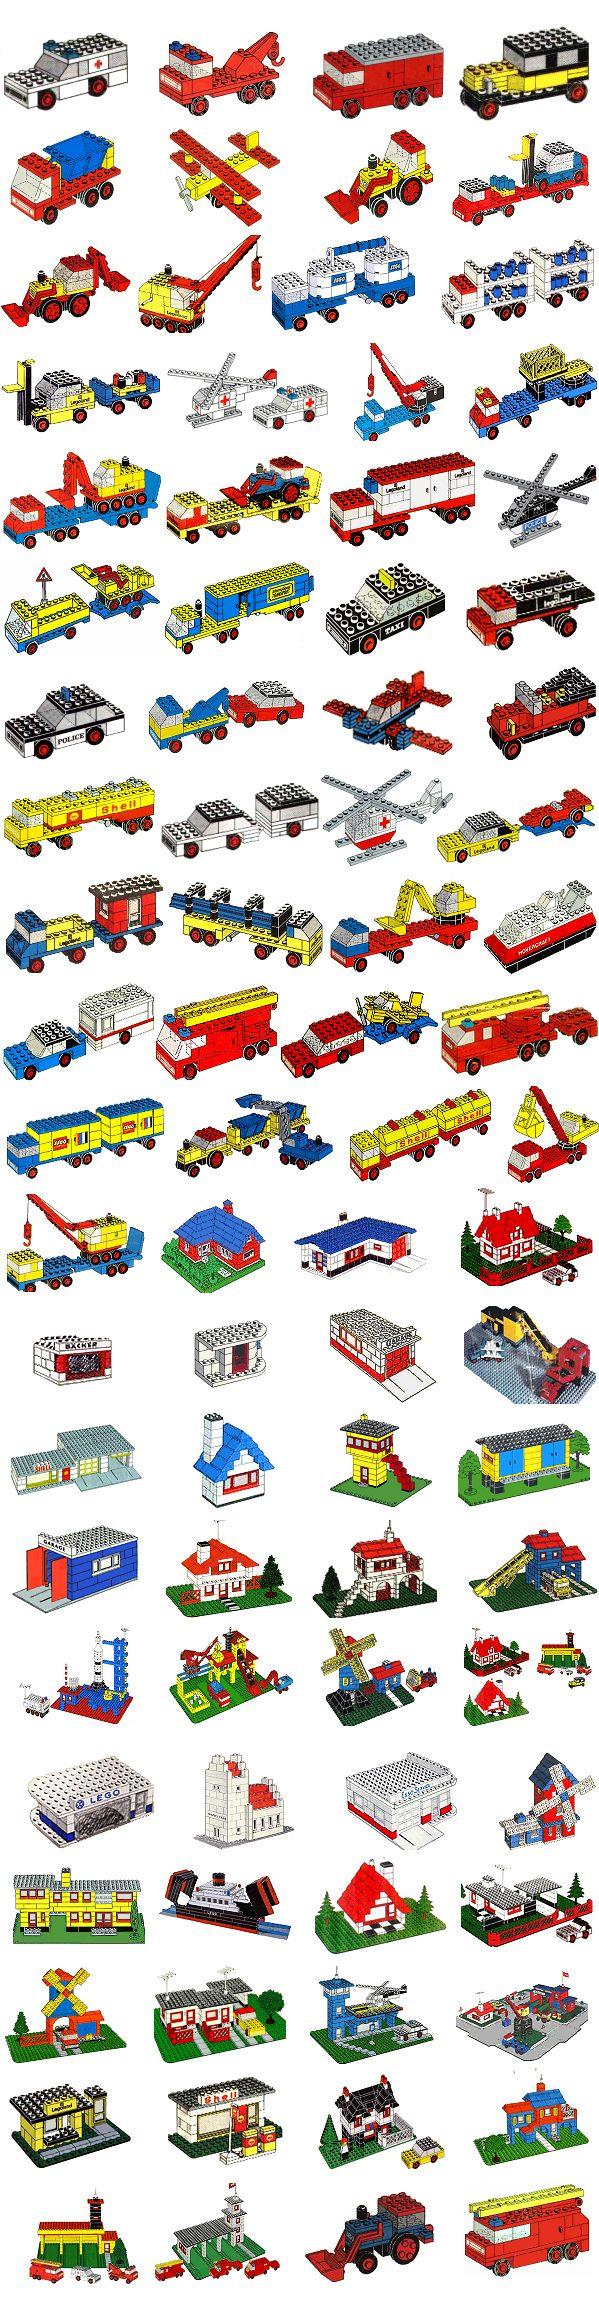 """Classic"" Legoland http://www.ebay.ca/usr/collectiblesbycandb"